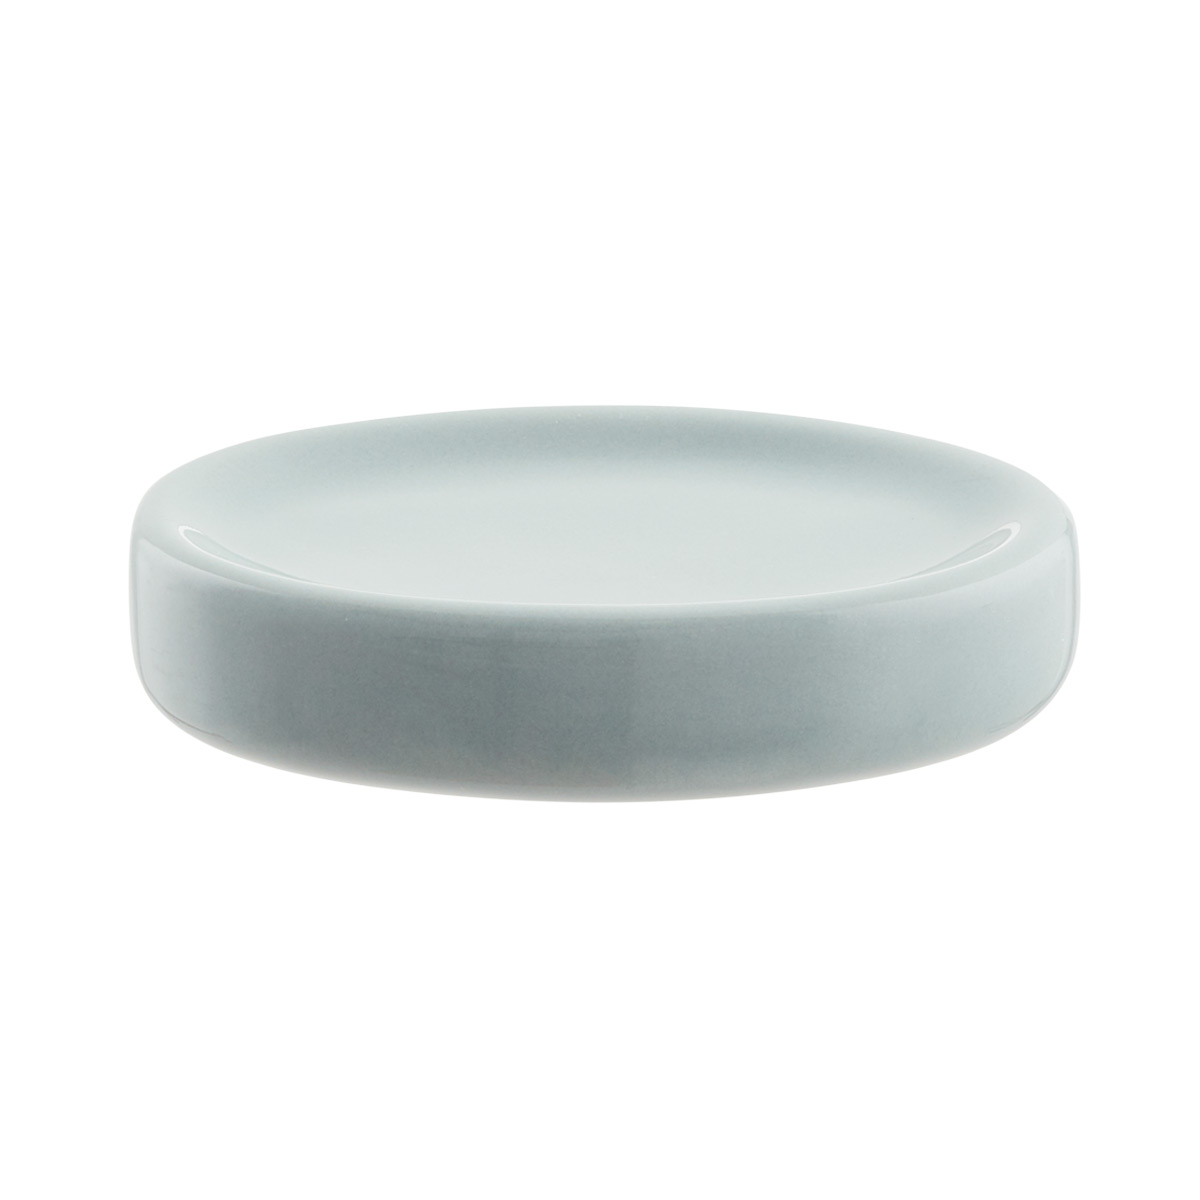 Serene Soap Dish